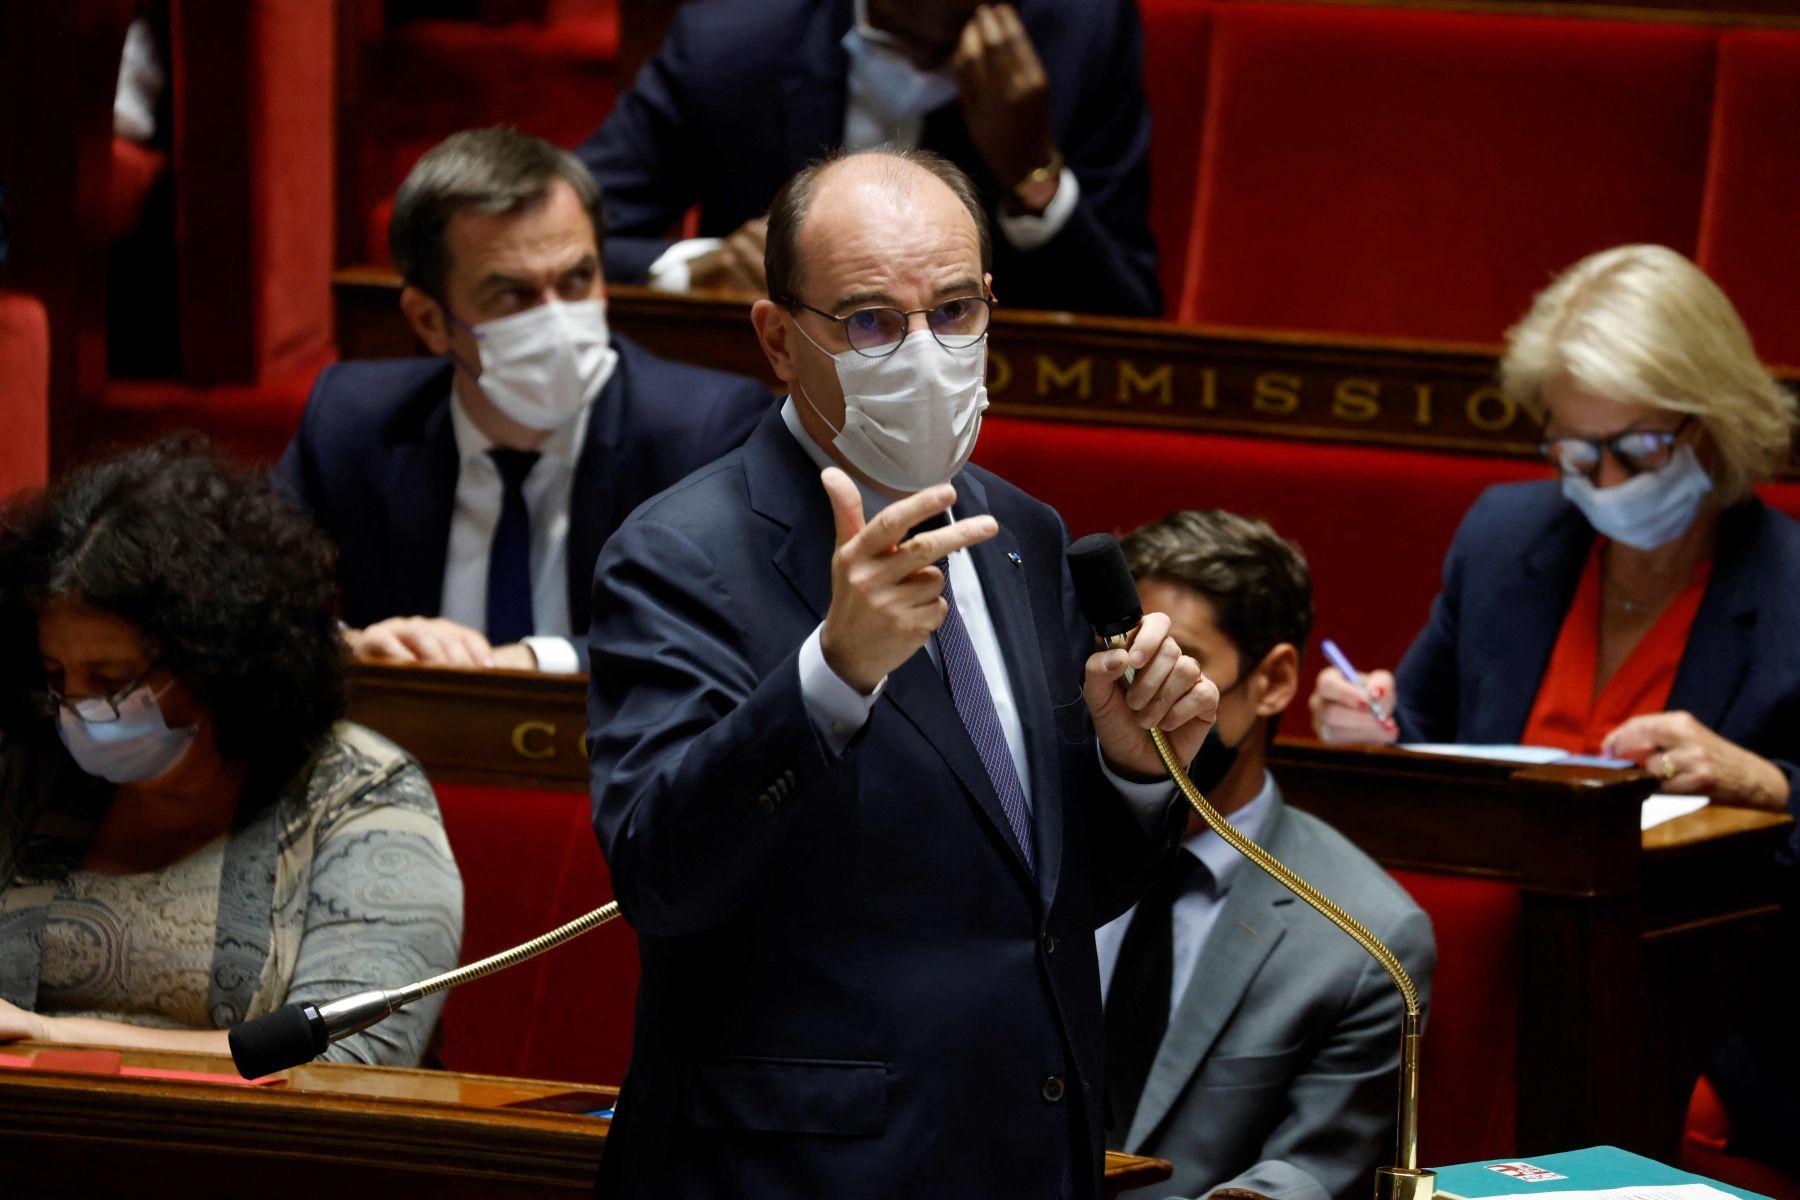 AFP/Ludovic MARIN